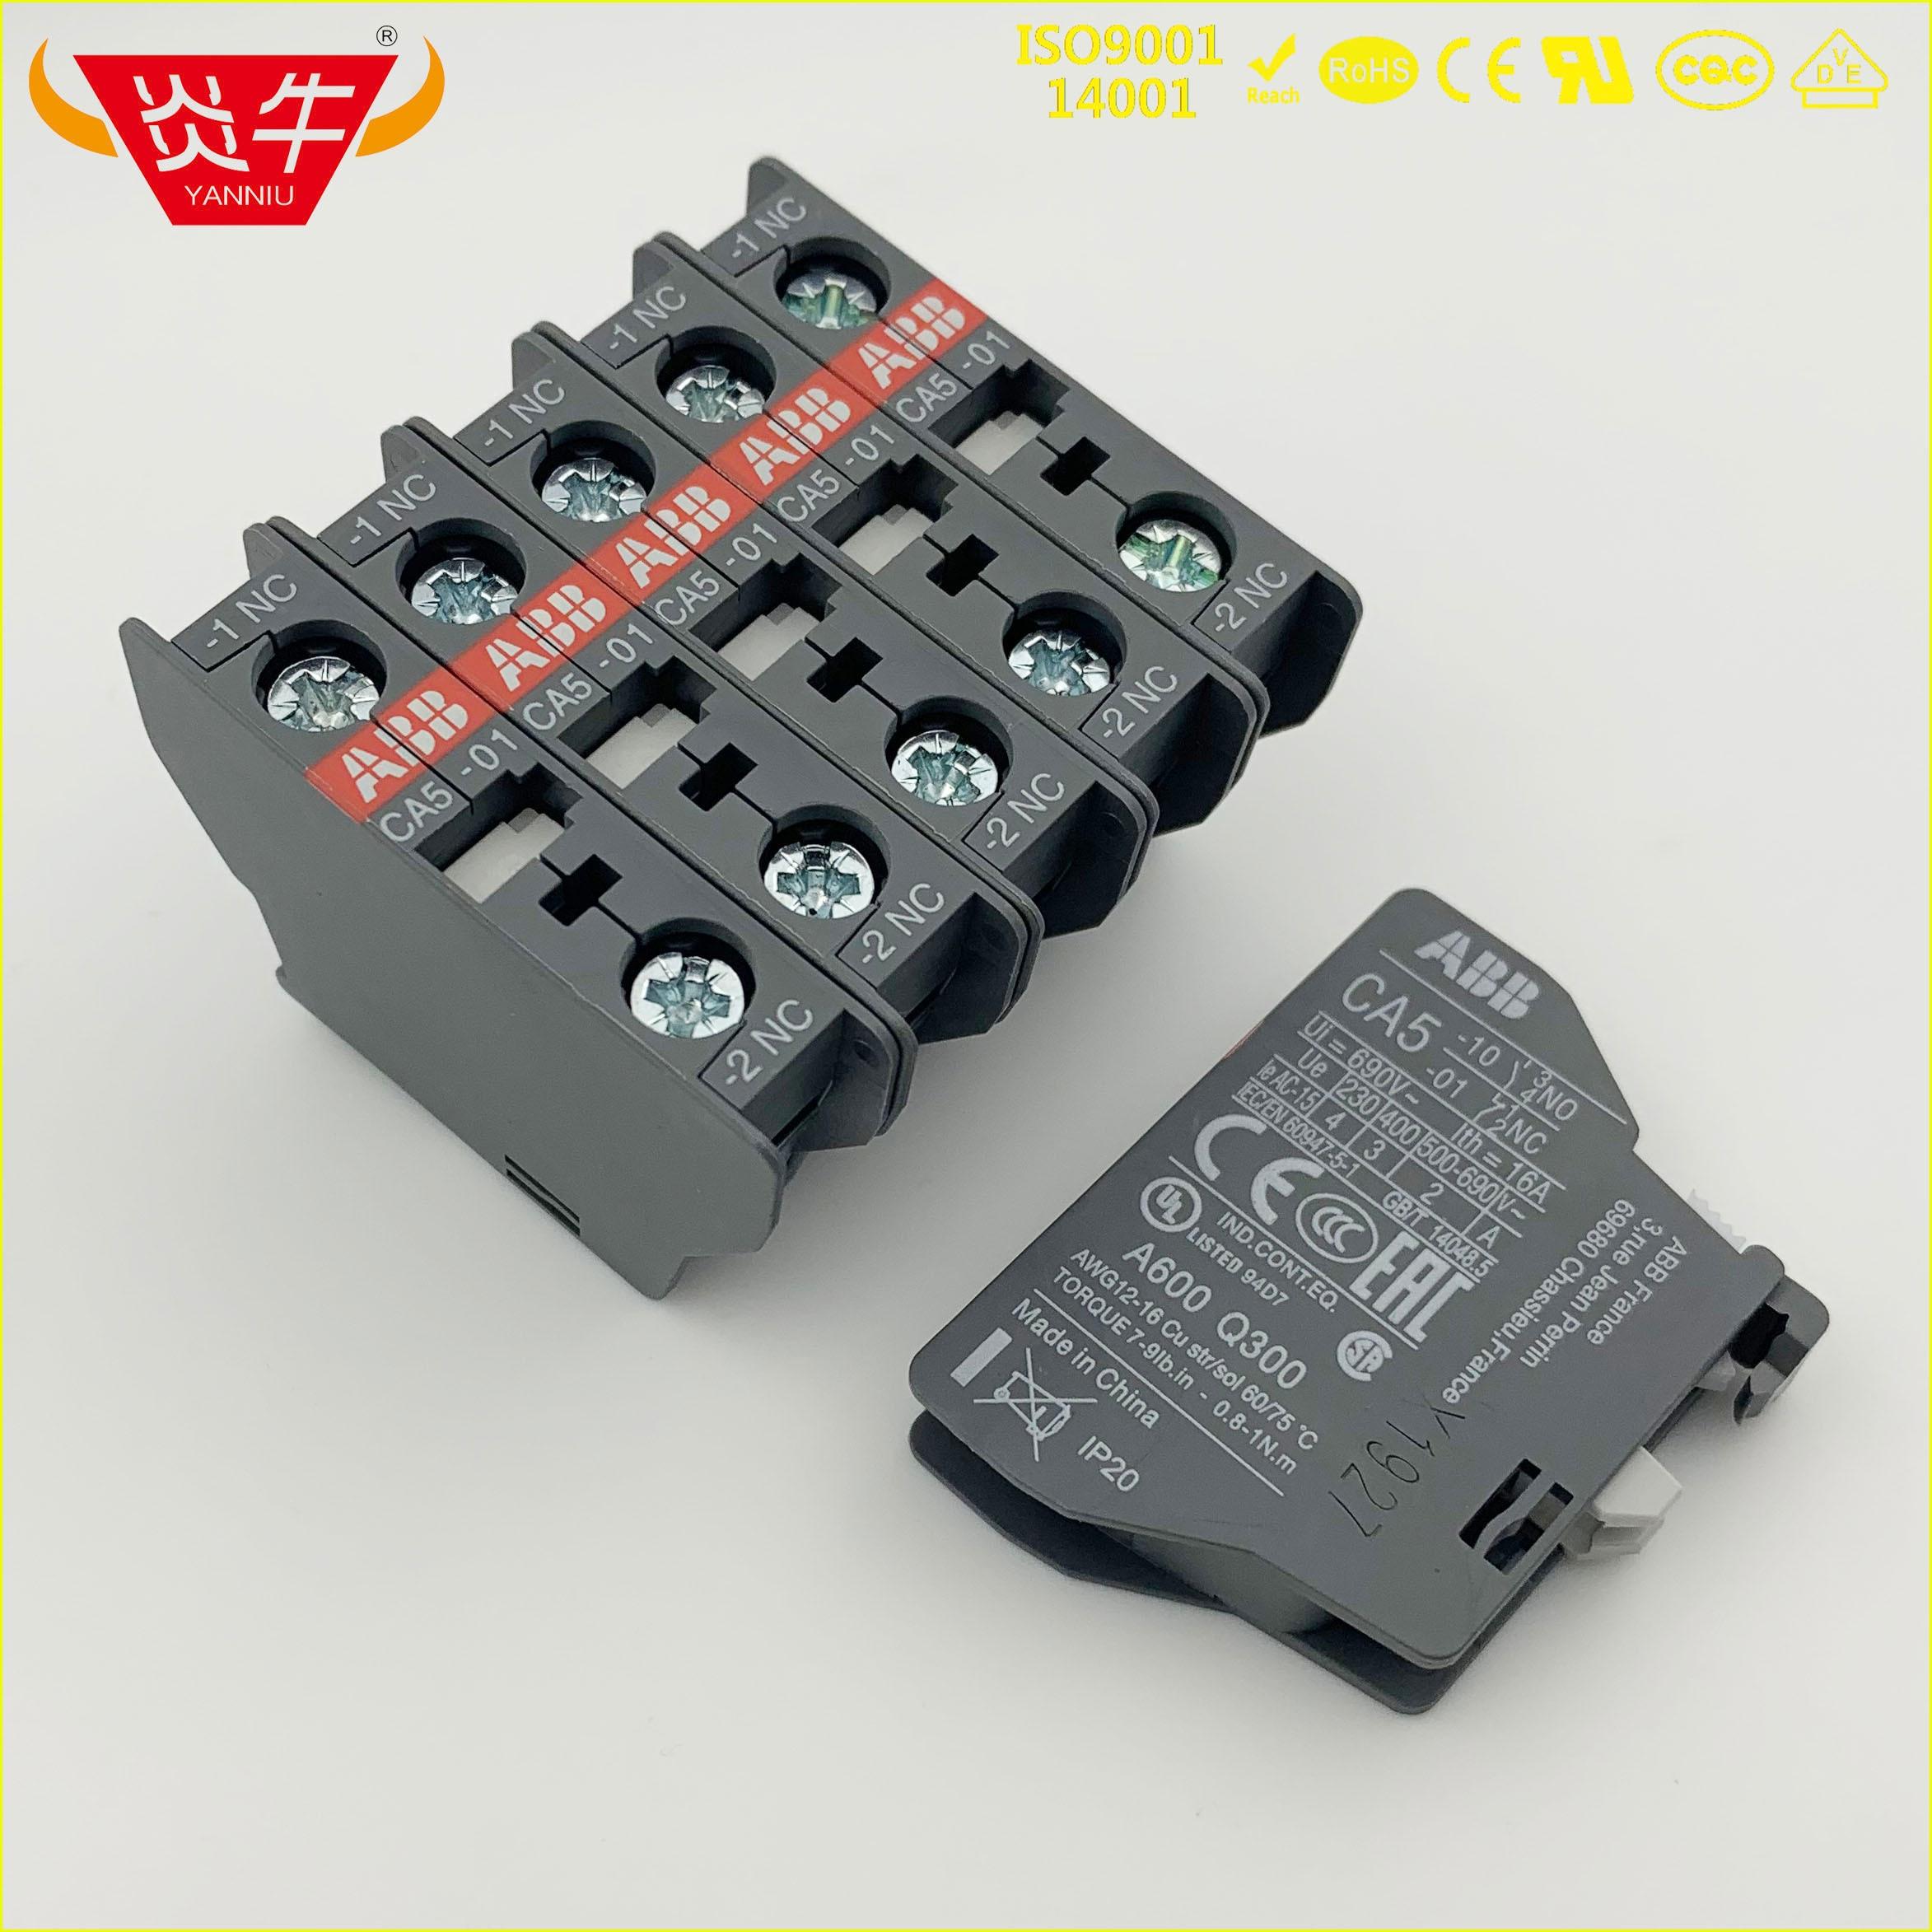 Anexo auxiliar CA5-01 1nc CA5-10 1no do contato do contator da c.a. de 10 pces abb